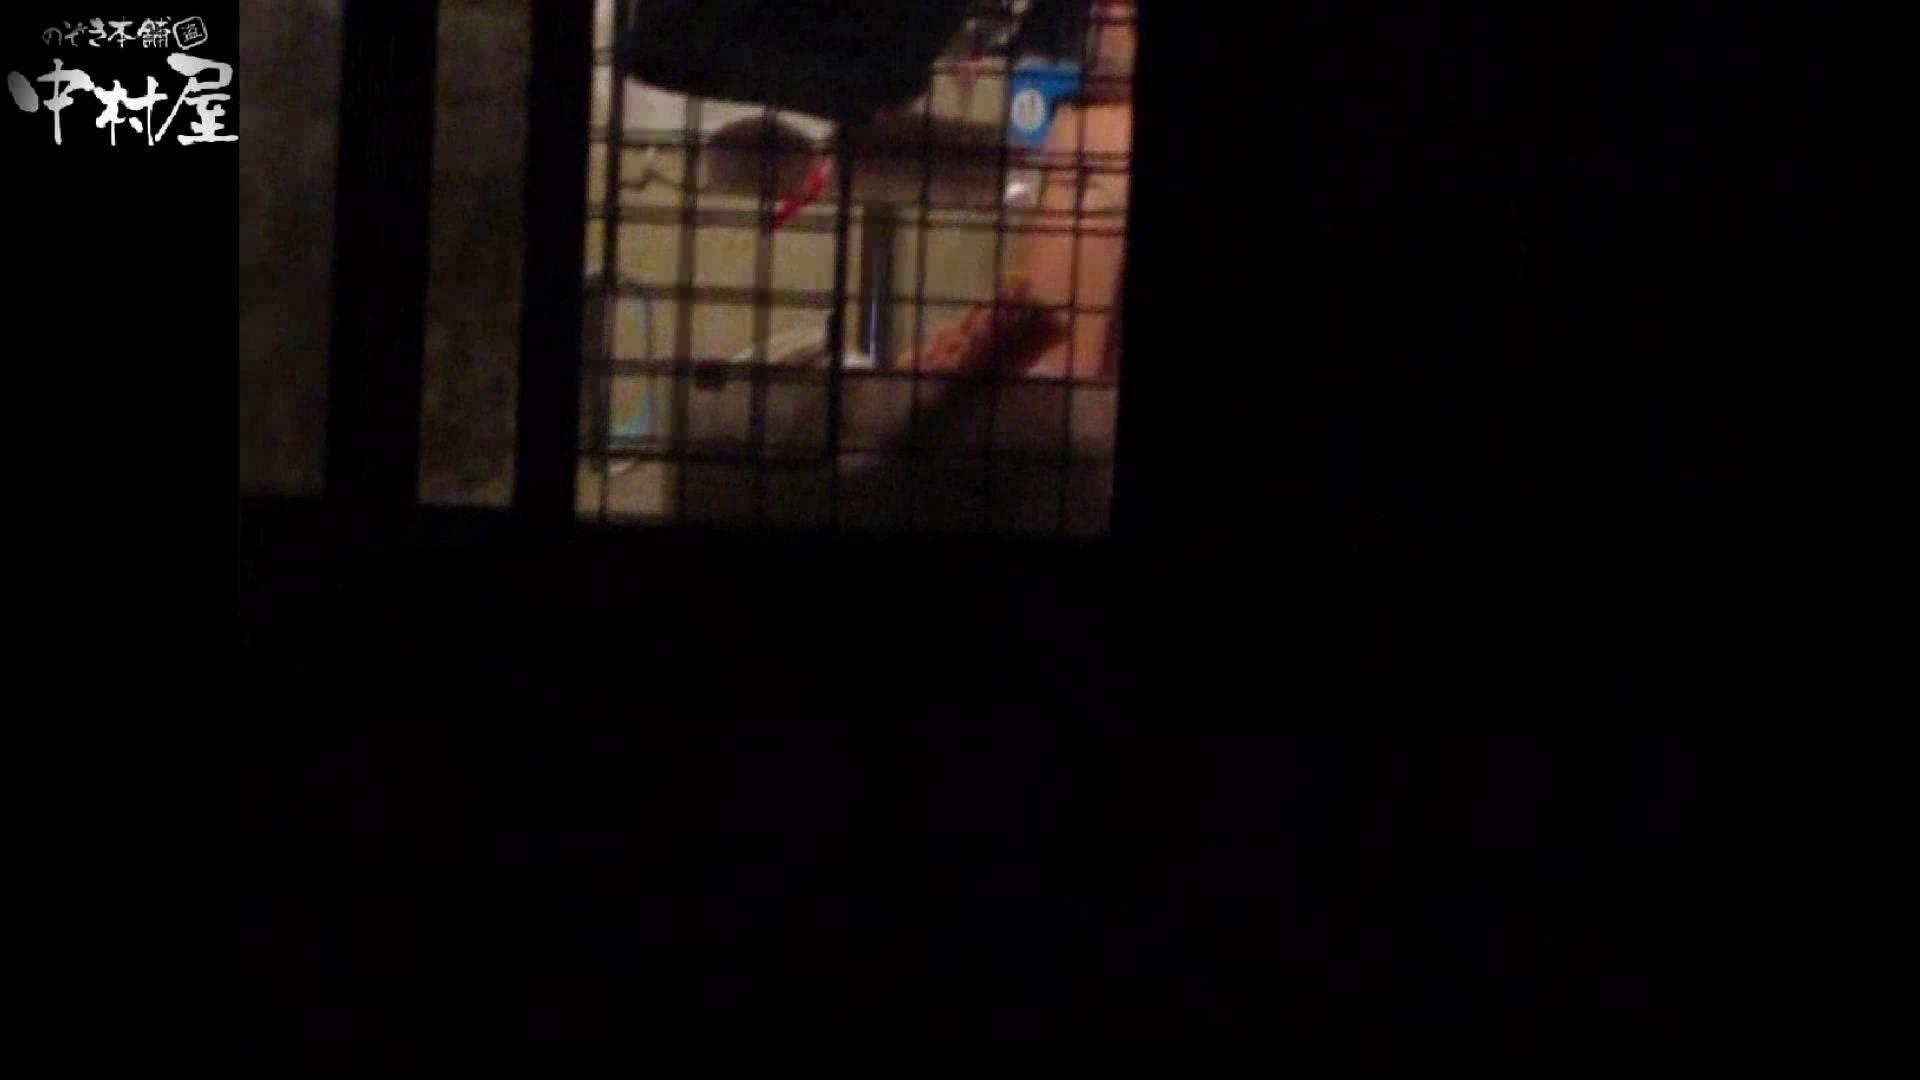 民家風呂専門盗撮師の超危険映像 vol.023 OLのエロ生活 性交動画流出 95連発 20